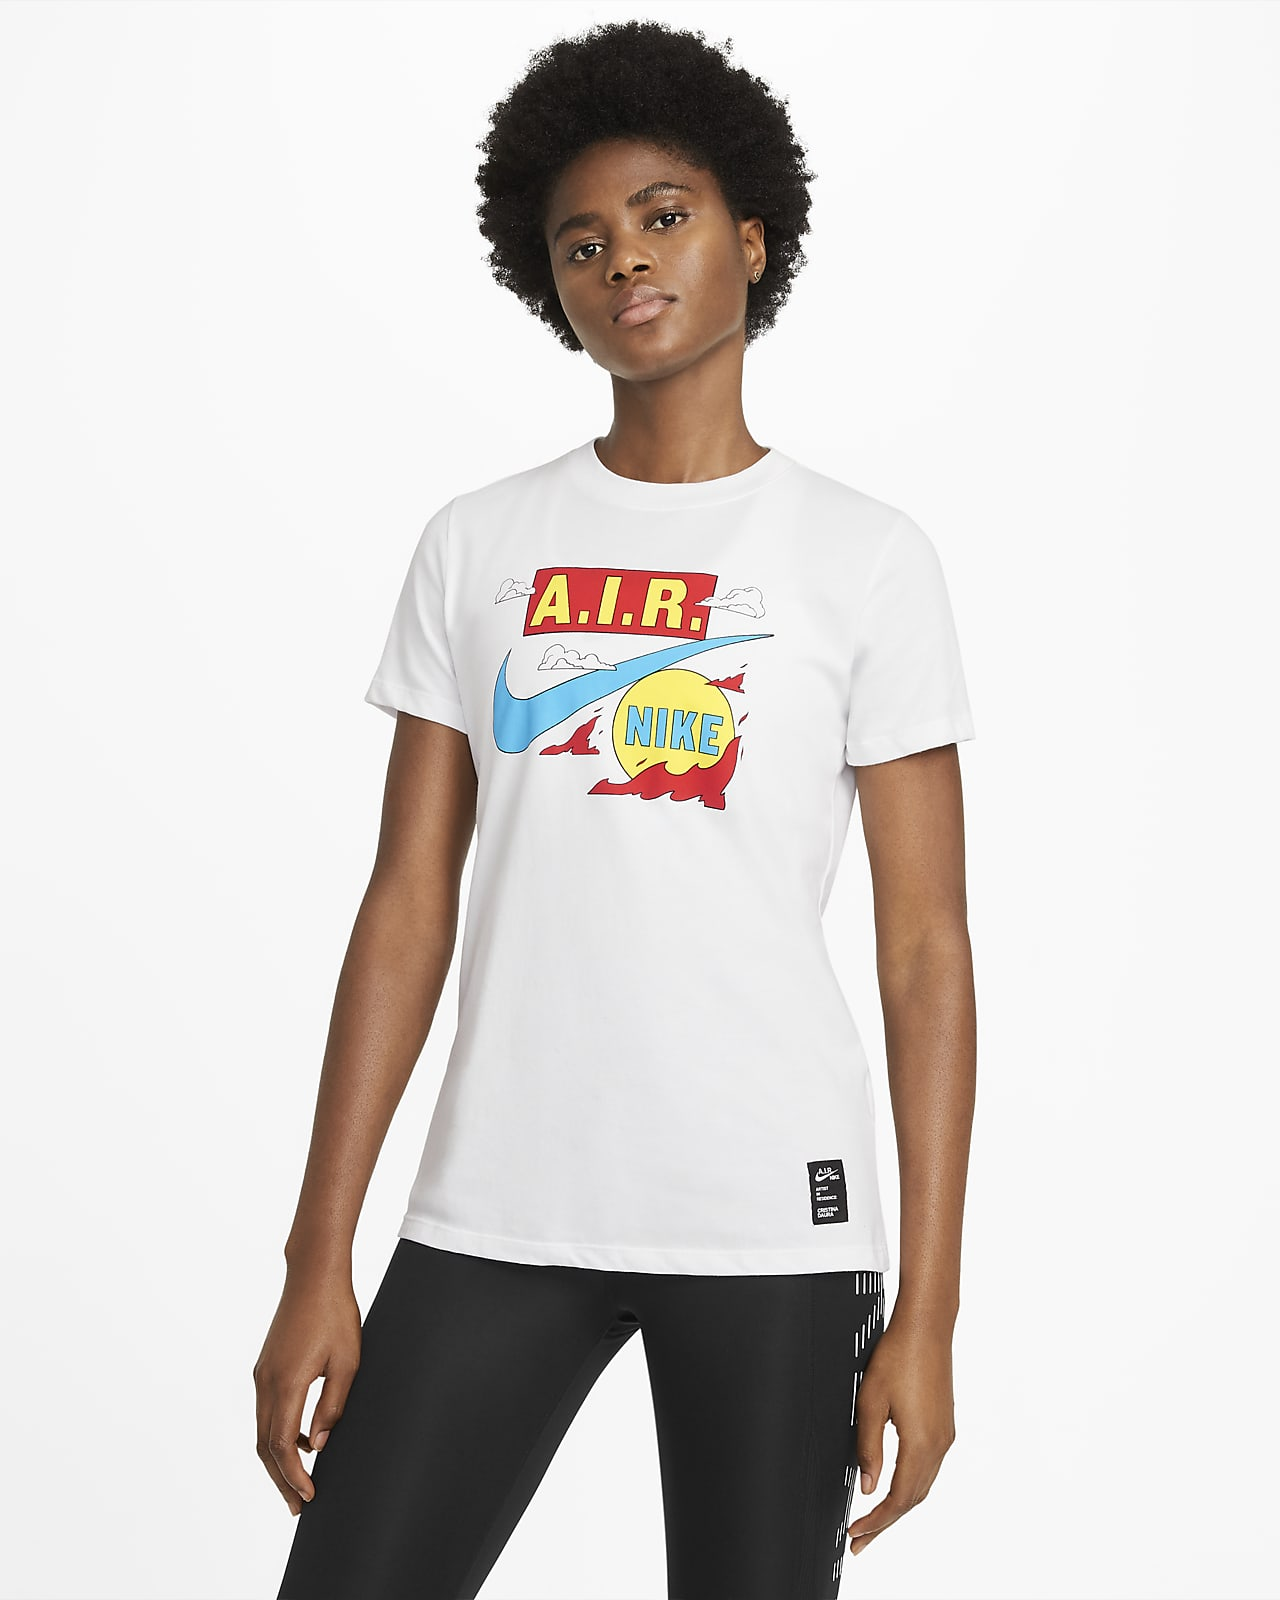 Nike Dri-FIT A.I.R. Cristina Daura Women's Short-Sleeve T-Shirt